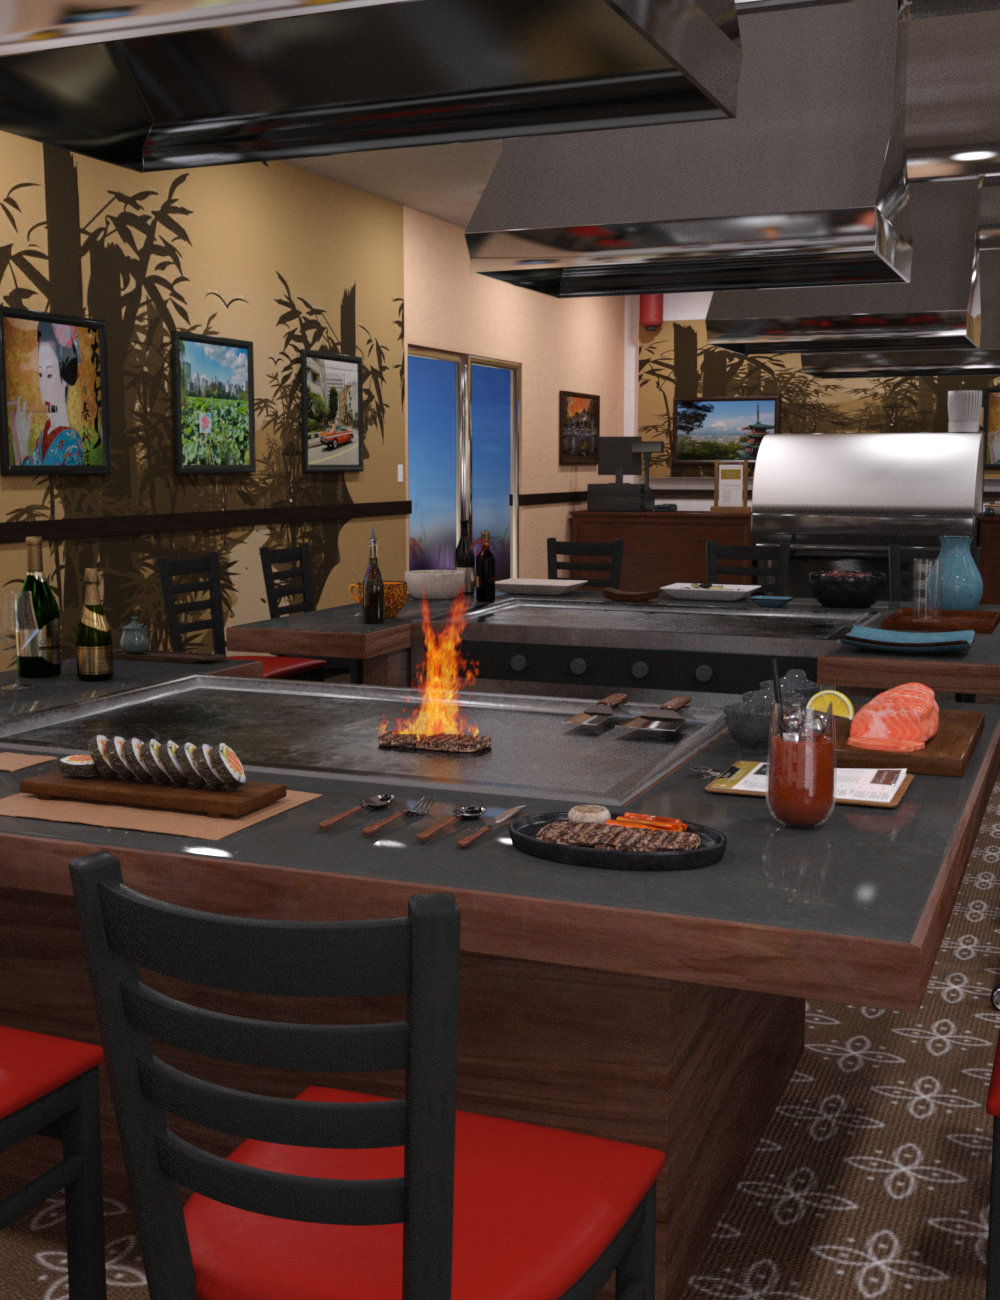 FG Japanese Steak House by: Fugazi1968Ironman, 3D Models by Daz 3D